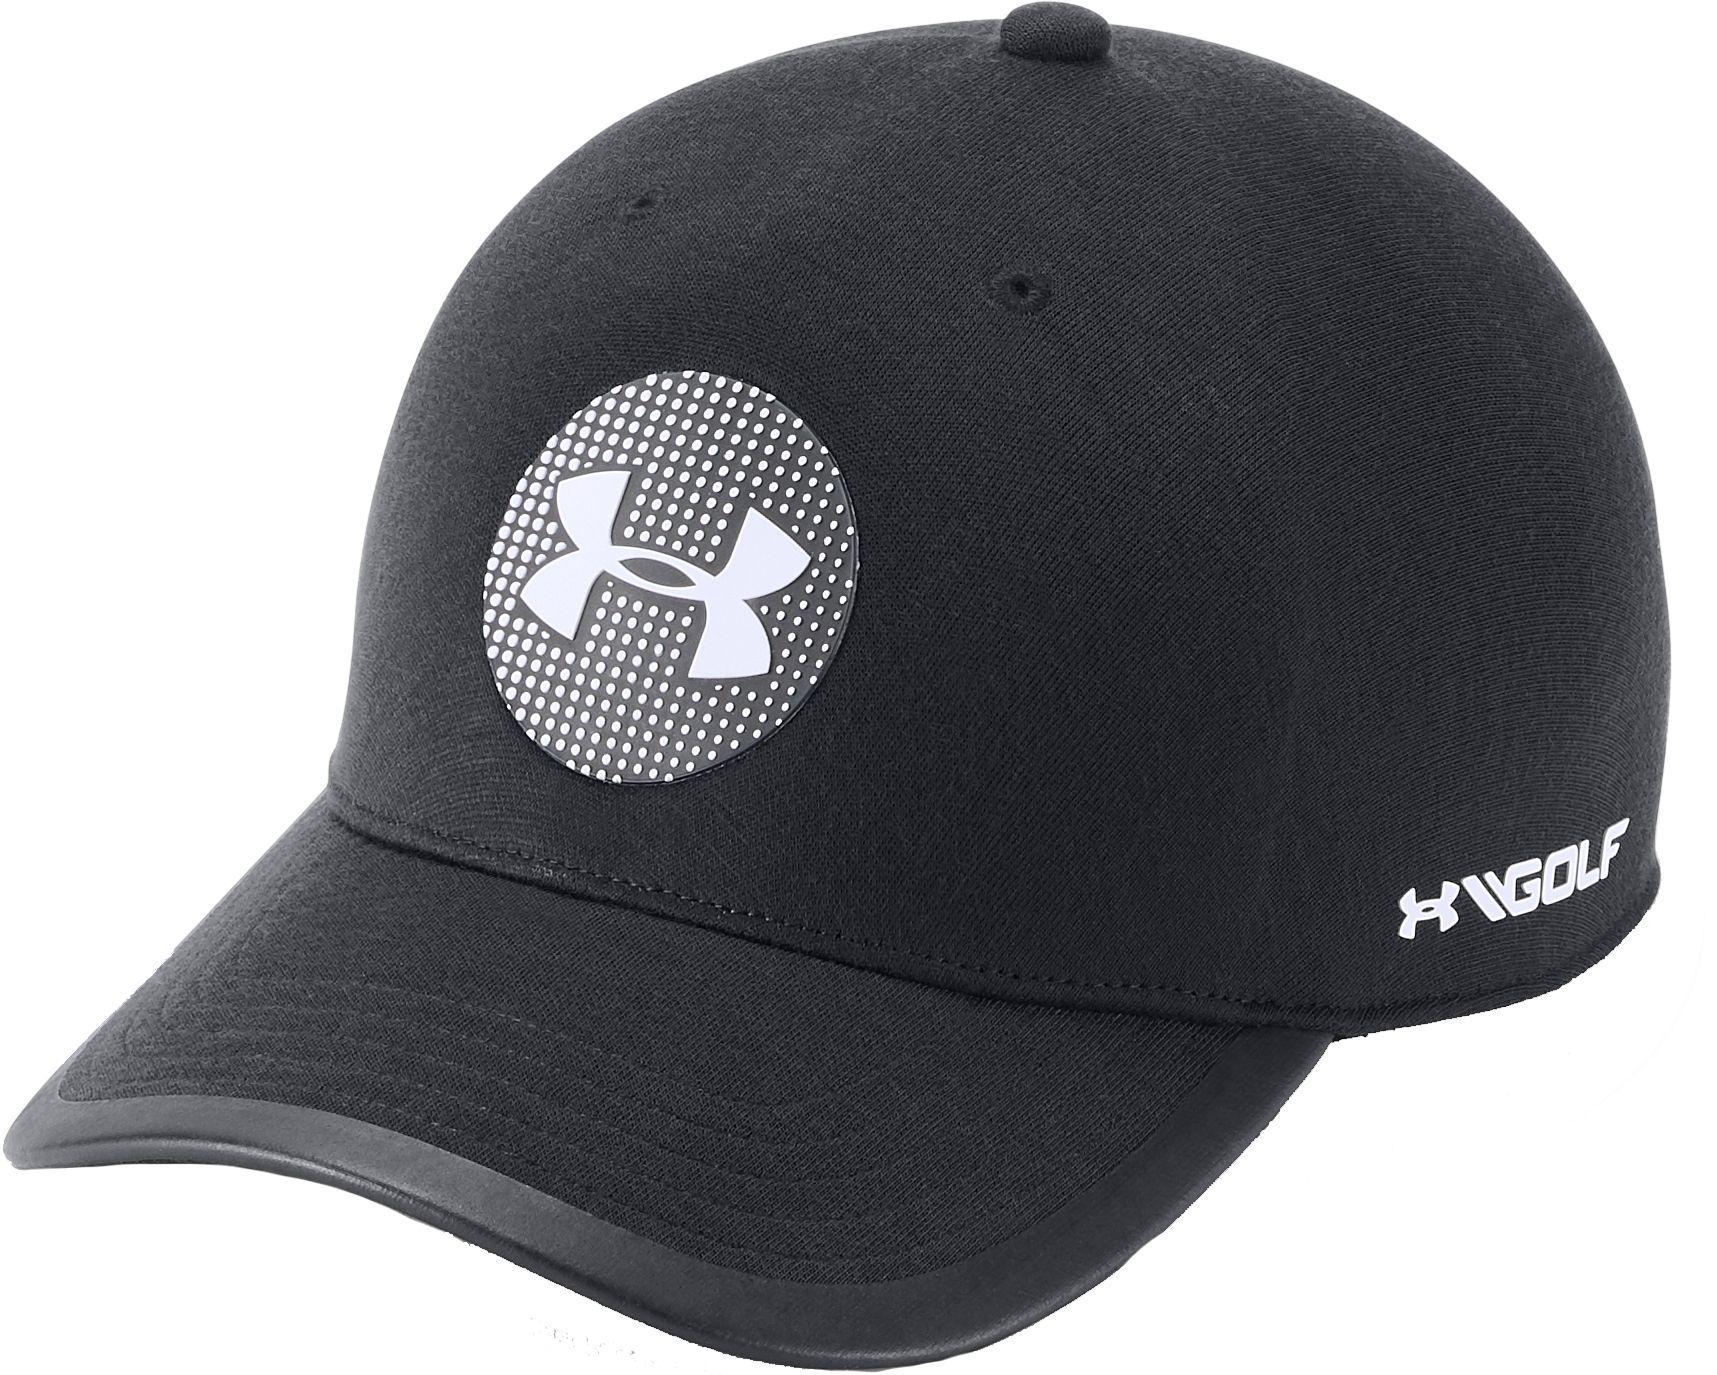 5535615baf5 Lyst - Under Armour Jordan Spieth Official Elevated Tour Golf Hat in ...